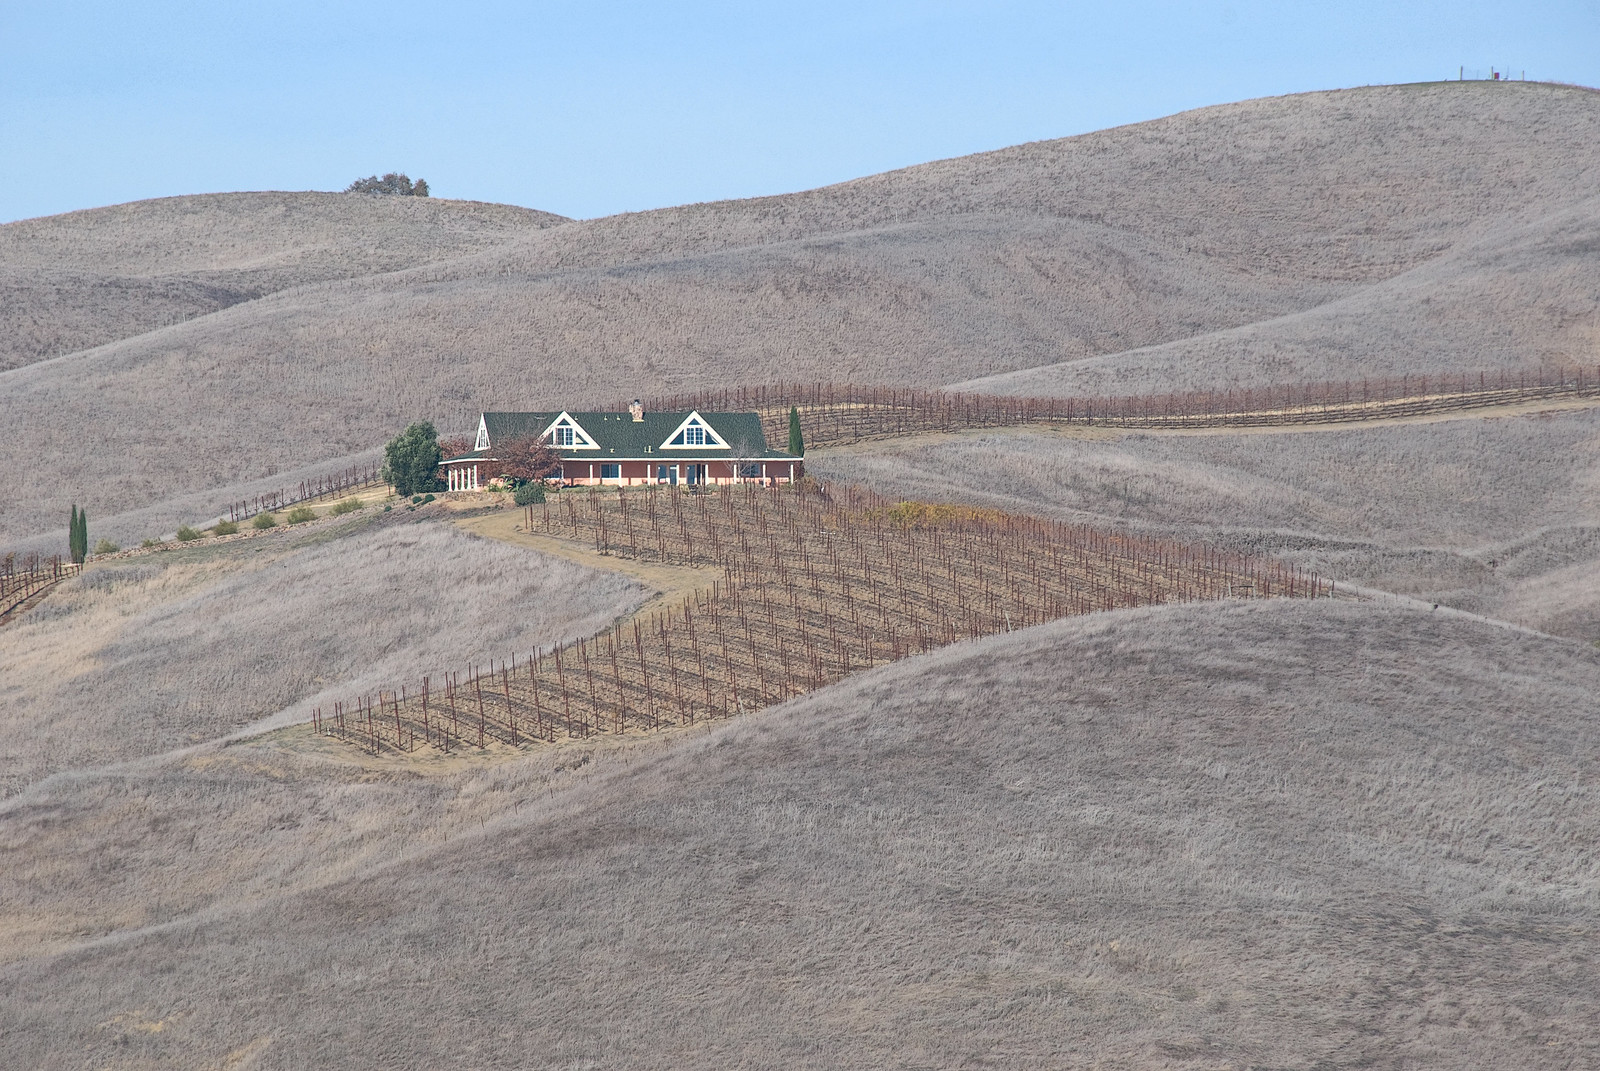 California Drought | by john weiss